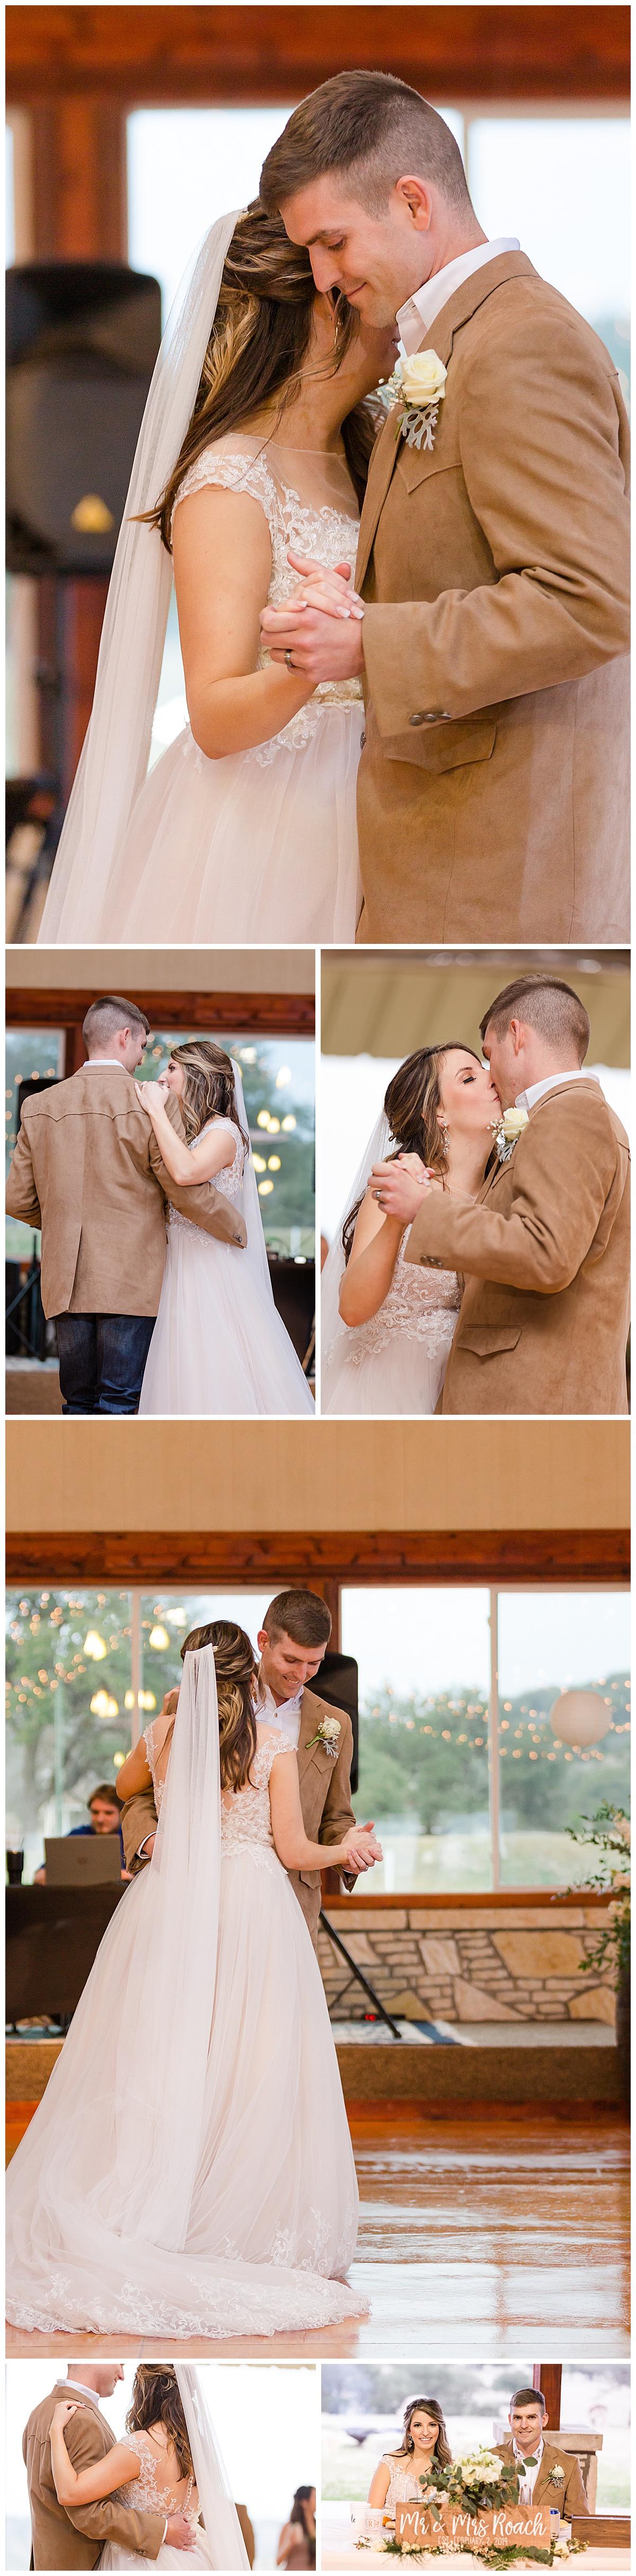 Wedding-Photographer-Texas-Hill-Country-Happy-H-Ranch-Comfor-Texas-Carly-Barton-Photography_0068.jpg